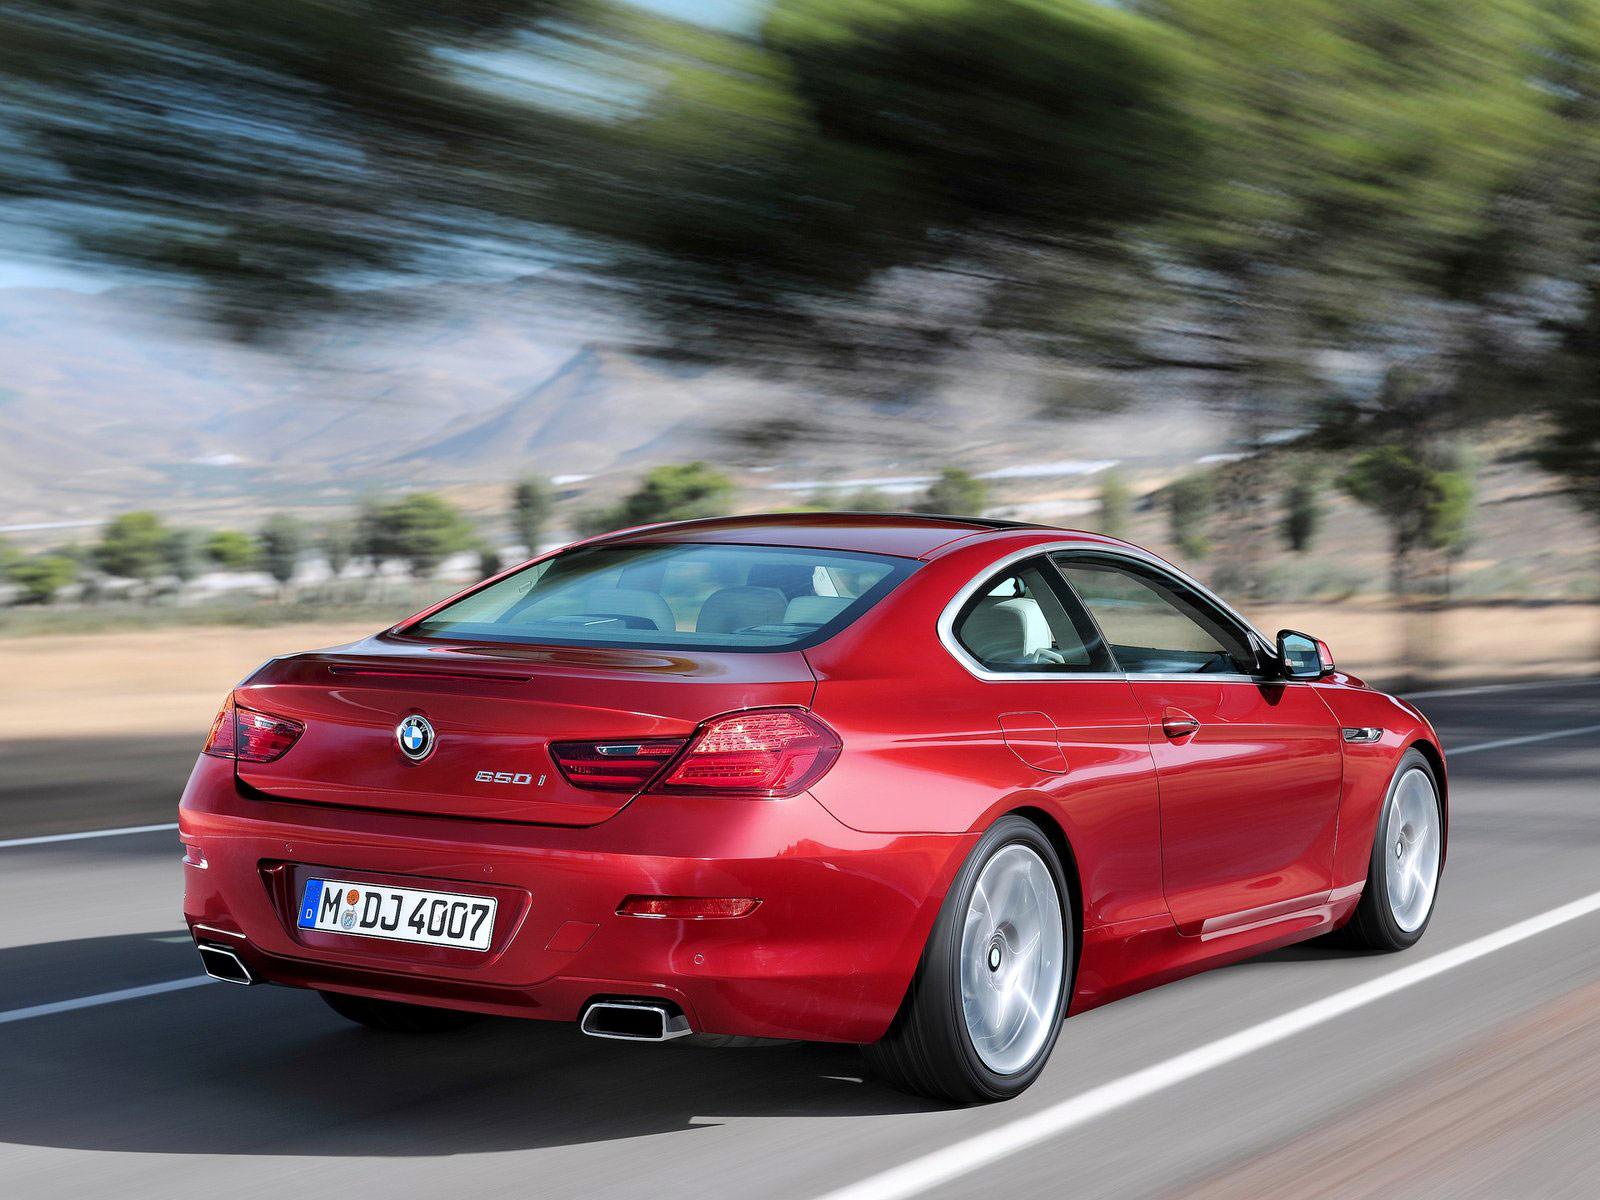 http://2.bp.blogspot.com/-e4U6BoB3gl0/TXyIrfYGzrI/AAAAAAAADAs/_Xp7GLe7sAc/s1600/2012_BMW_6-Series_Coupe_mobil-BMW_05.jpg